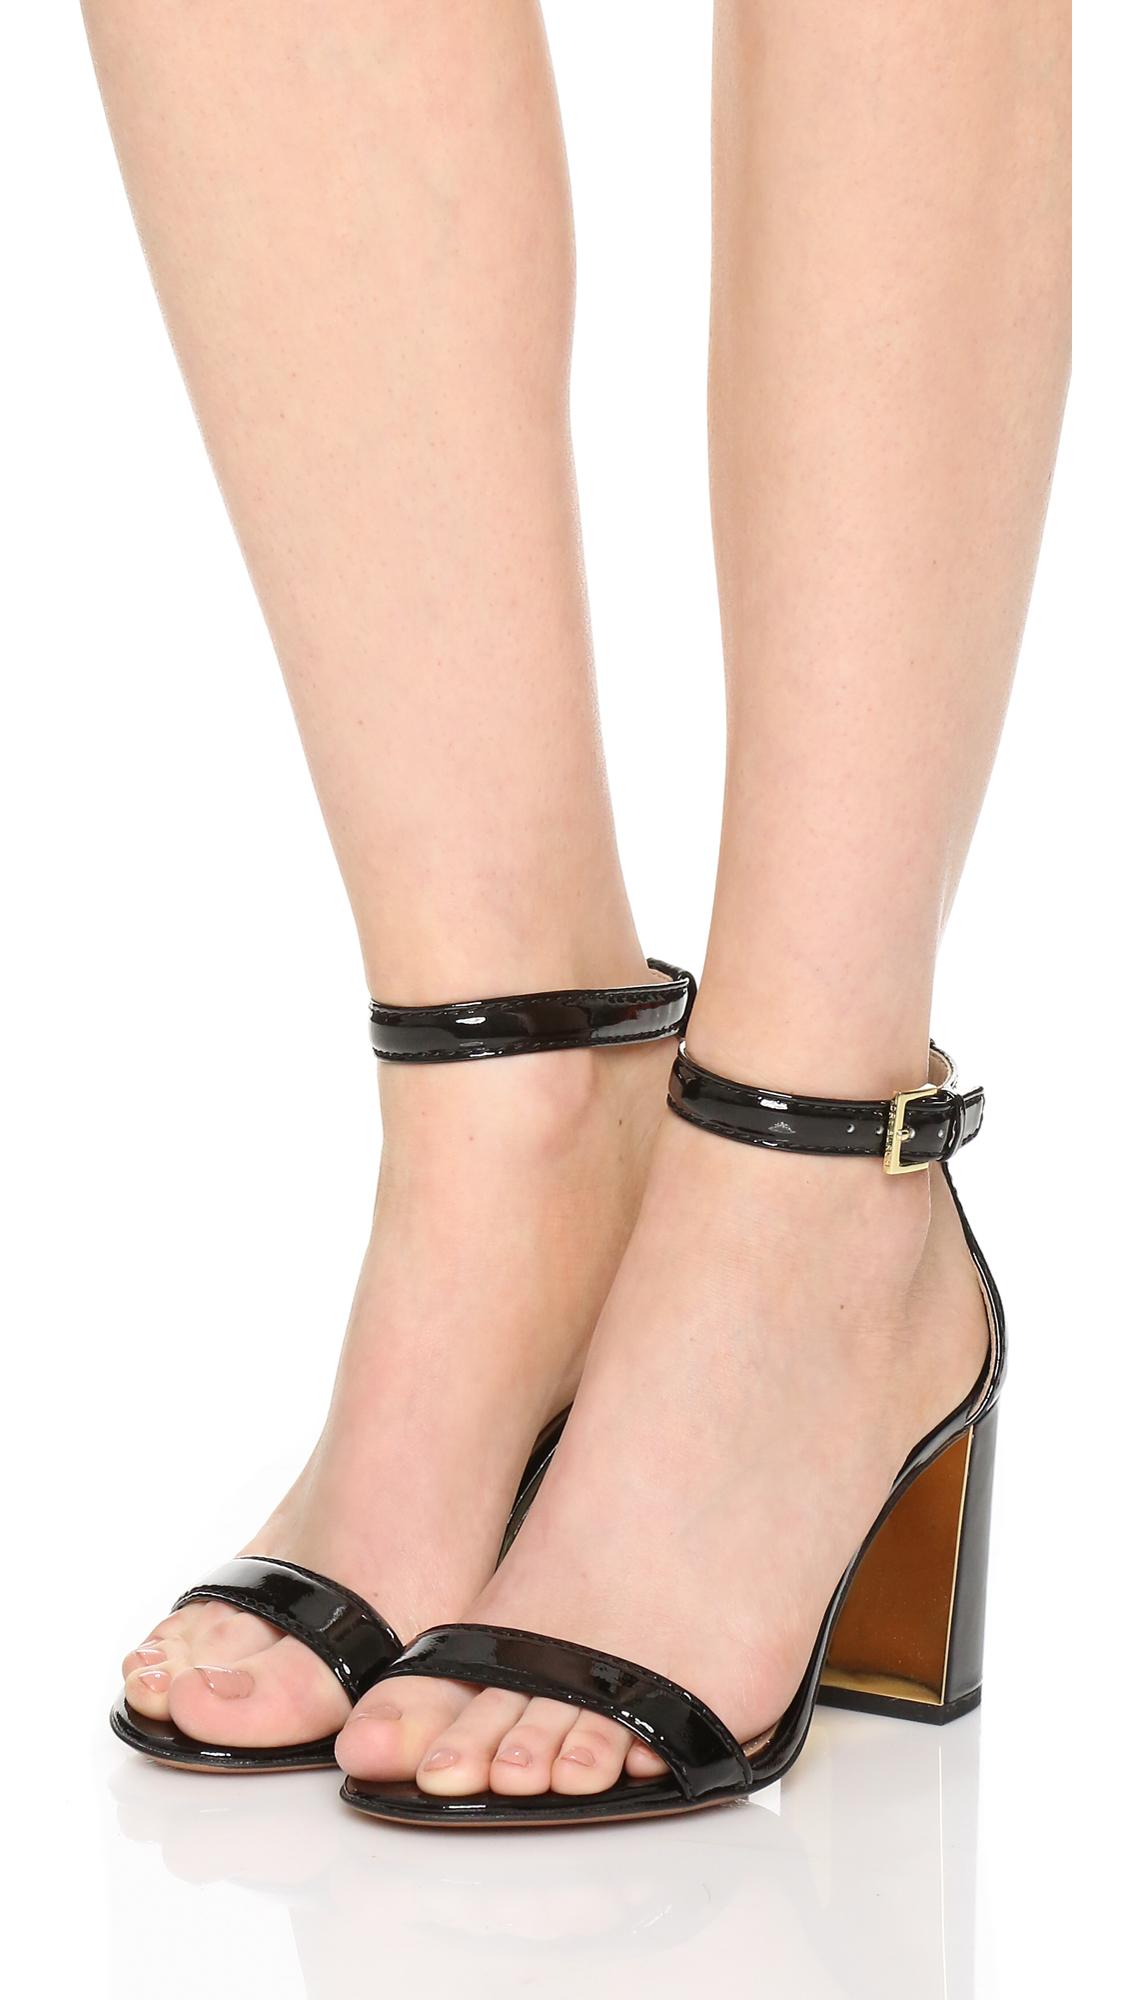 621c0645d9610 Lyst - Tory Burch Cecile Sandals in Black